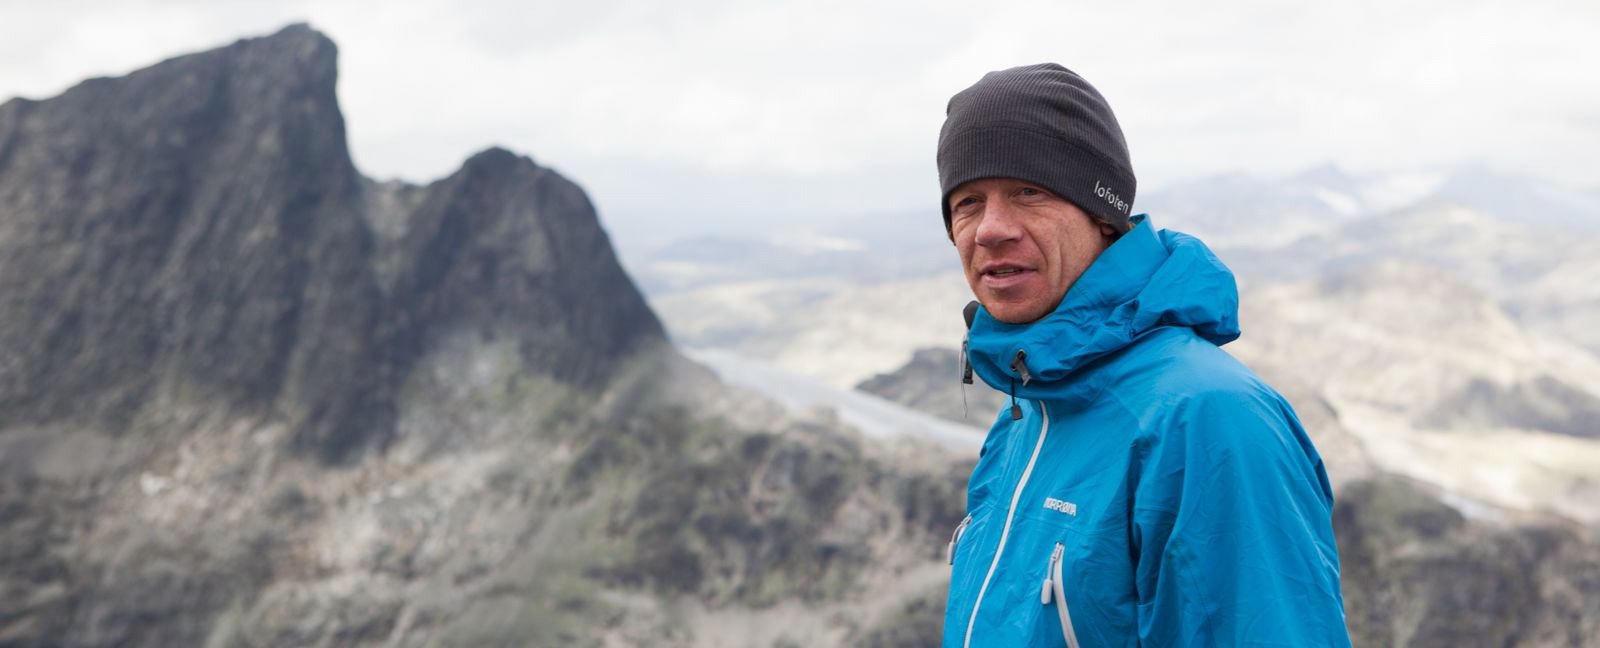 Norrona ambassador and professional climber Robert Caspersen